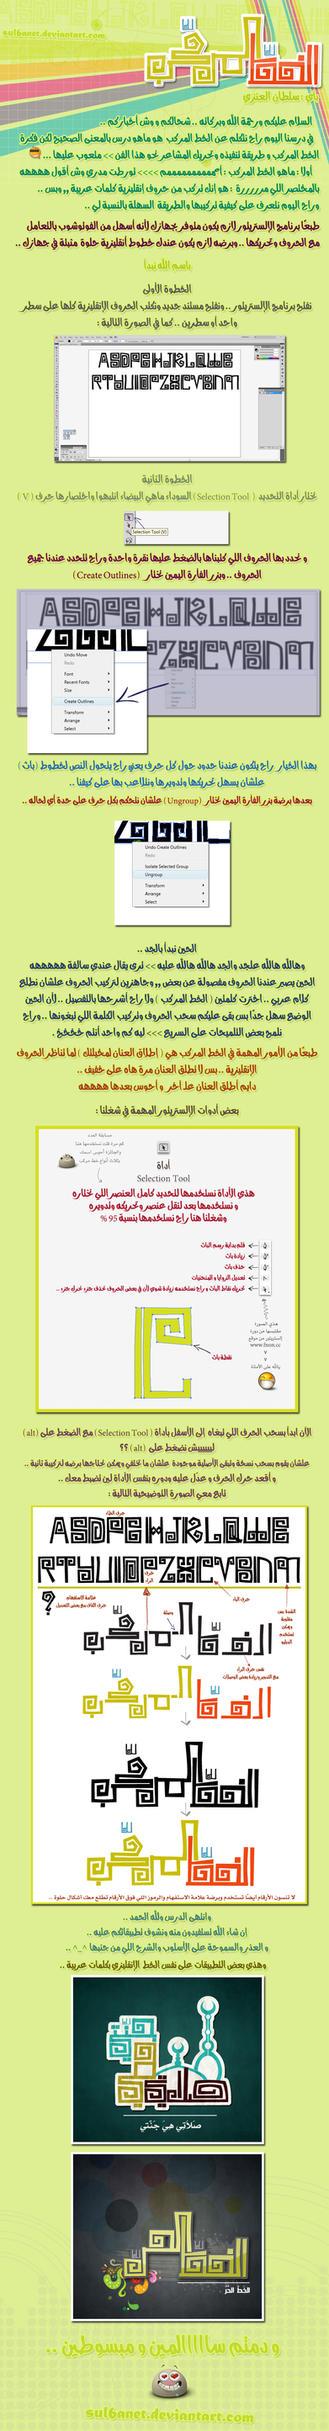 Drs al5a6 almurakab by sul6anet